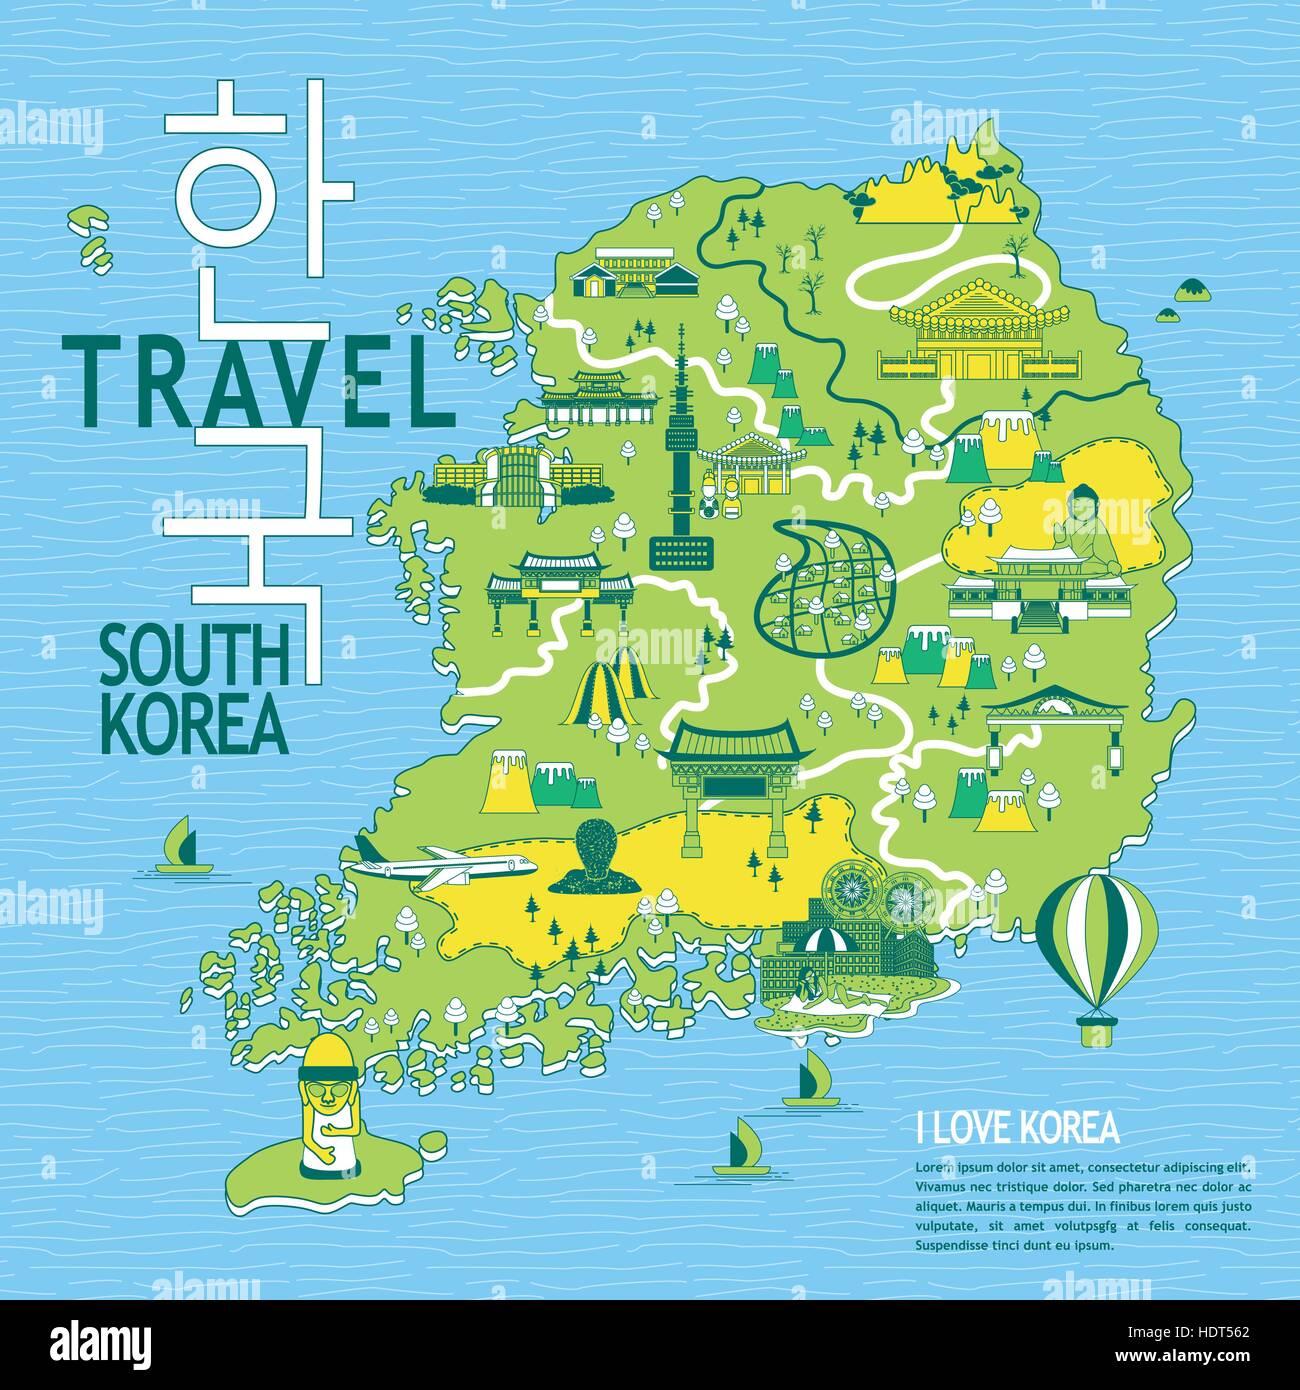 Südkorea Karte.Schöne Südkorea Reise Karte Korea In Koreanische Wörter Auf Oben